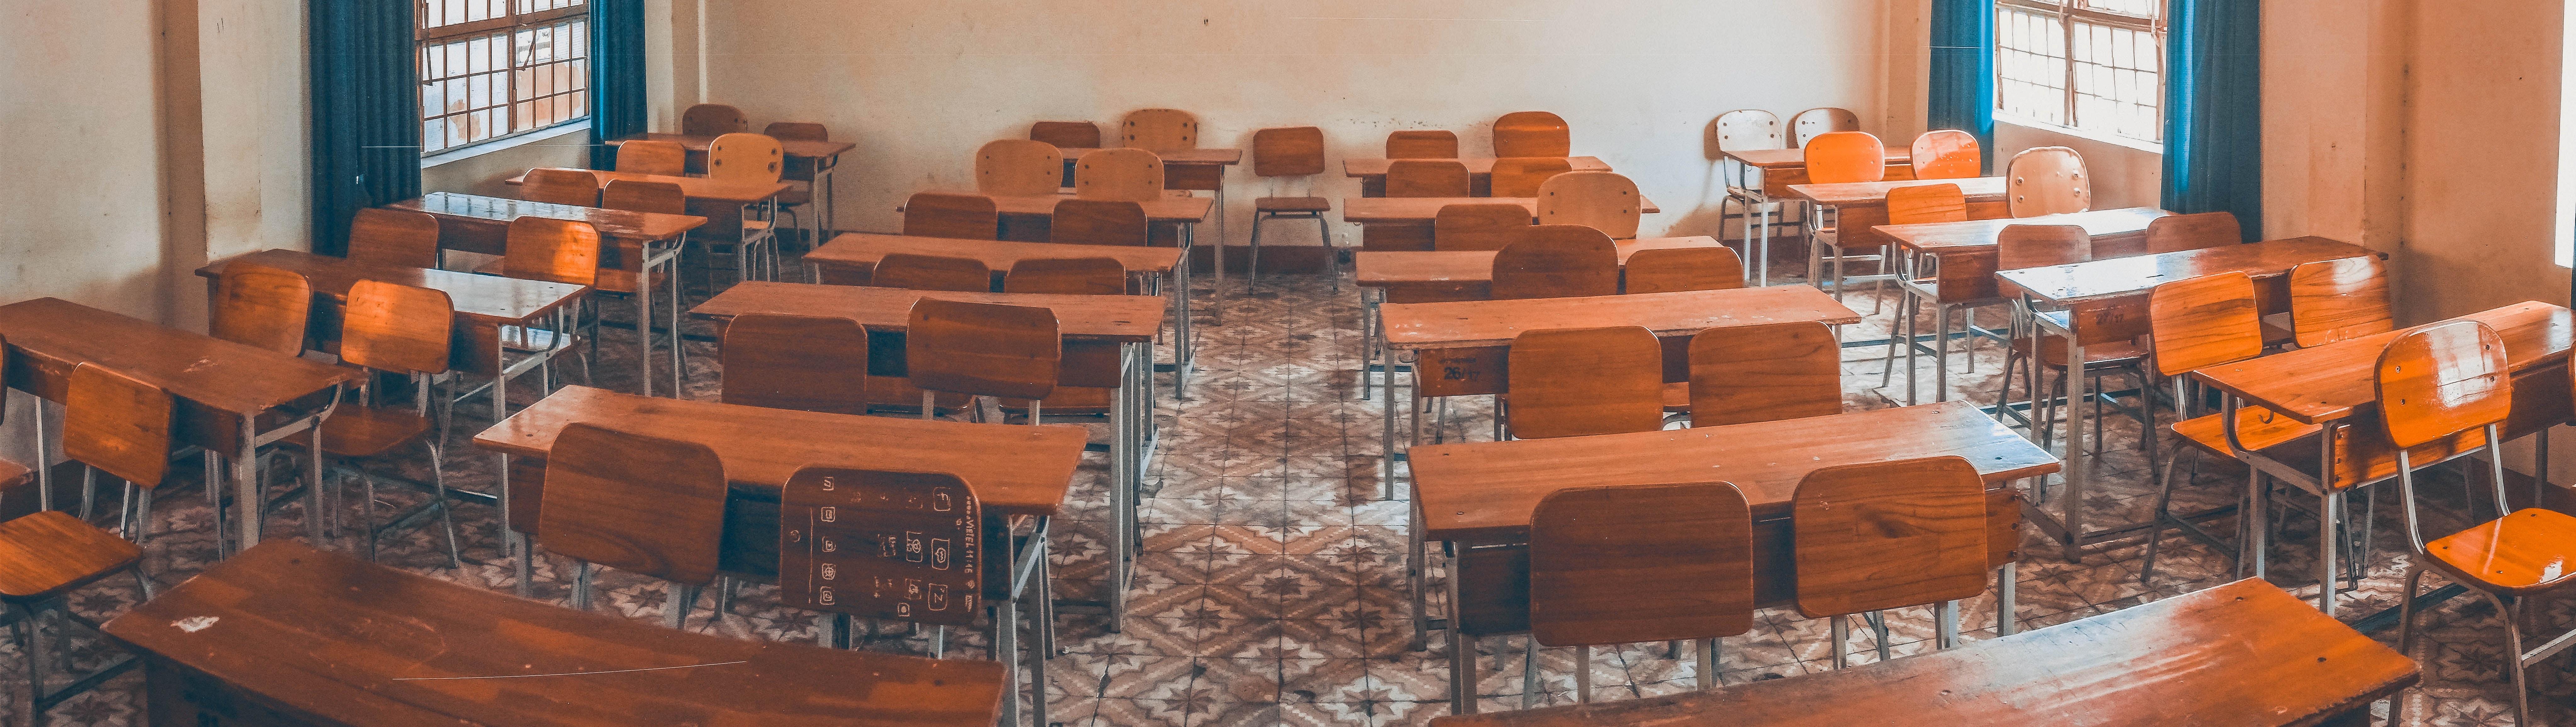 Teacher Loan Forgiveness